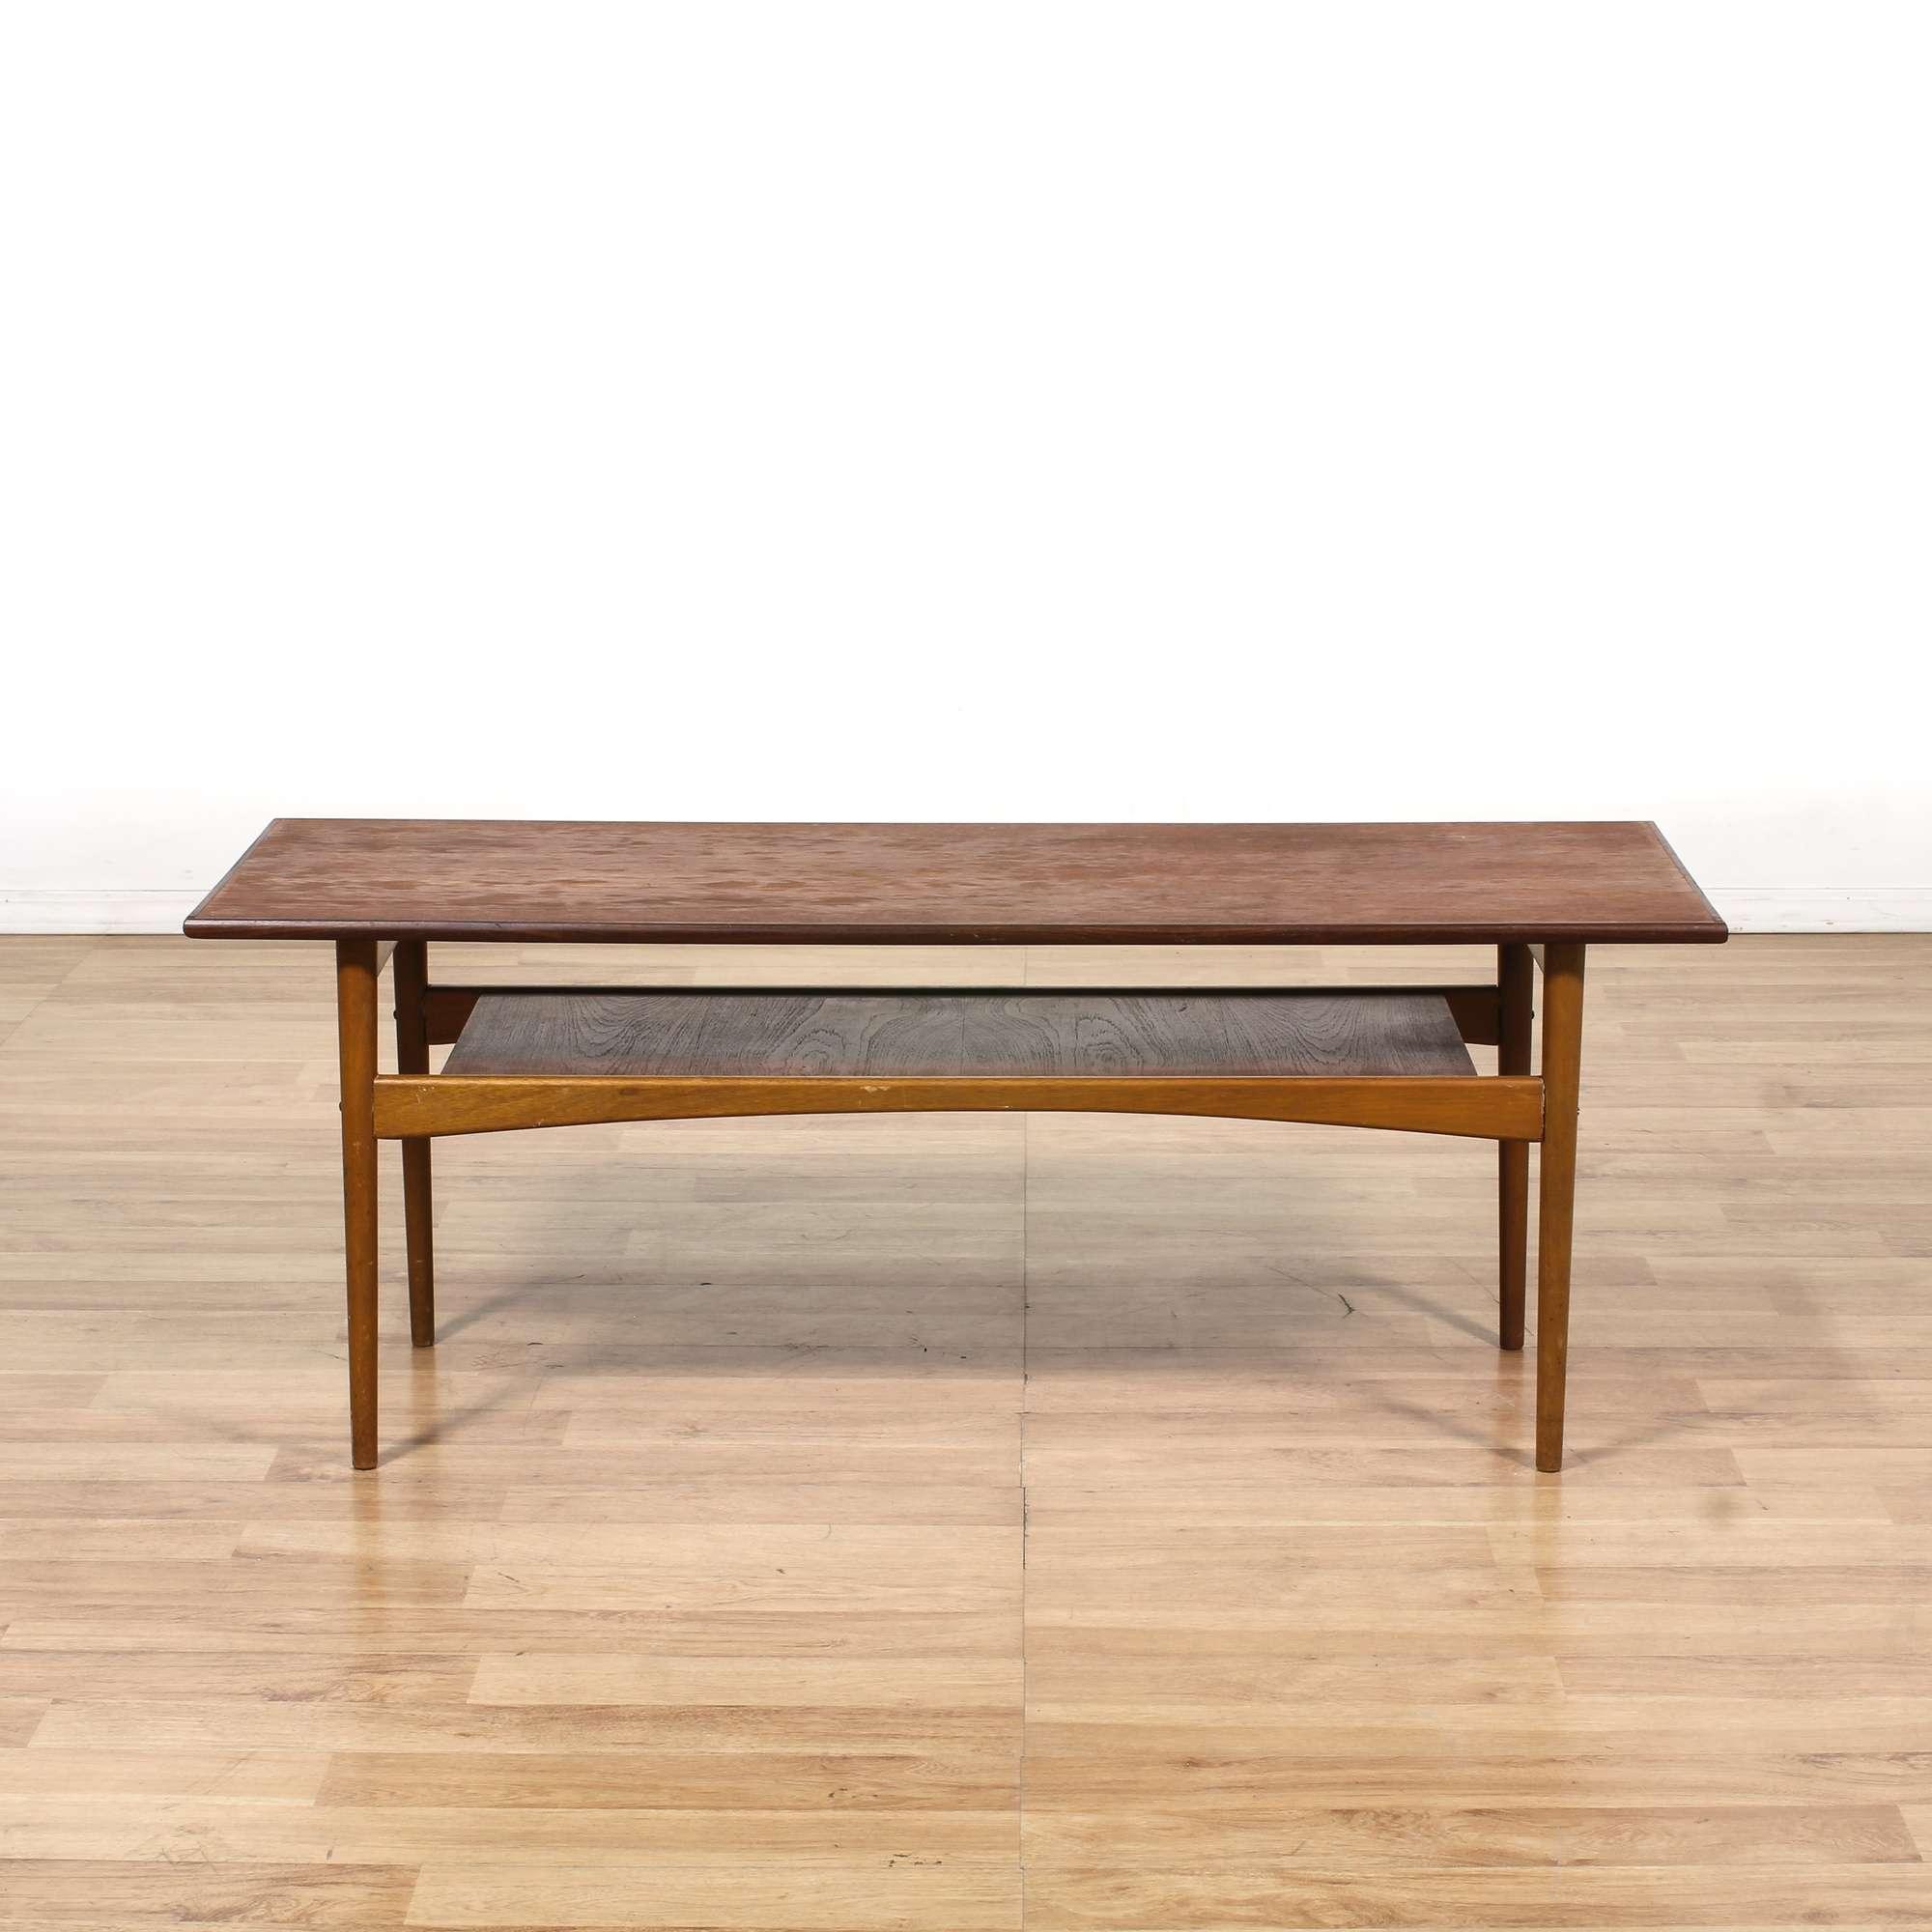 Surprising Danish Modern Coffee Table W Shelf Loveseat Vintage Uwap Interior Chair Design Uwaporg